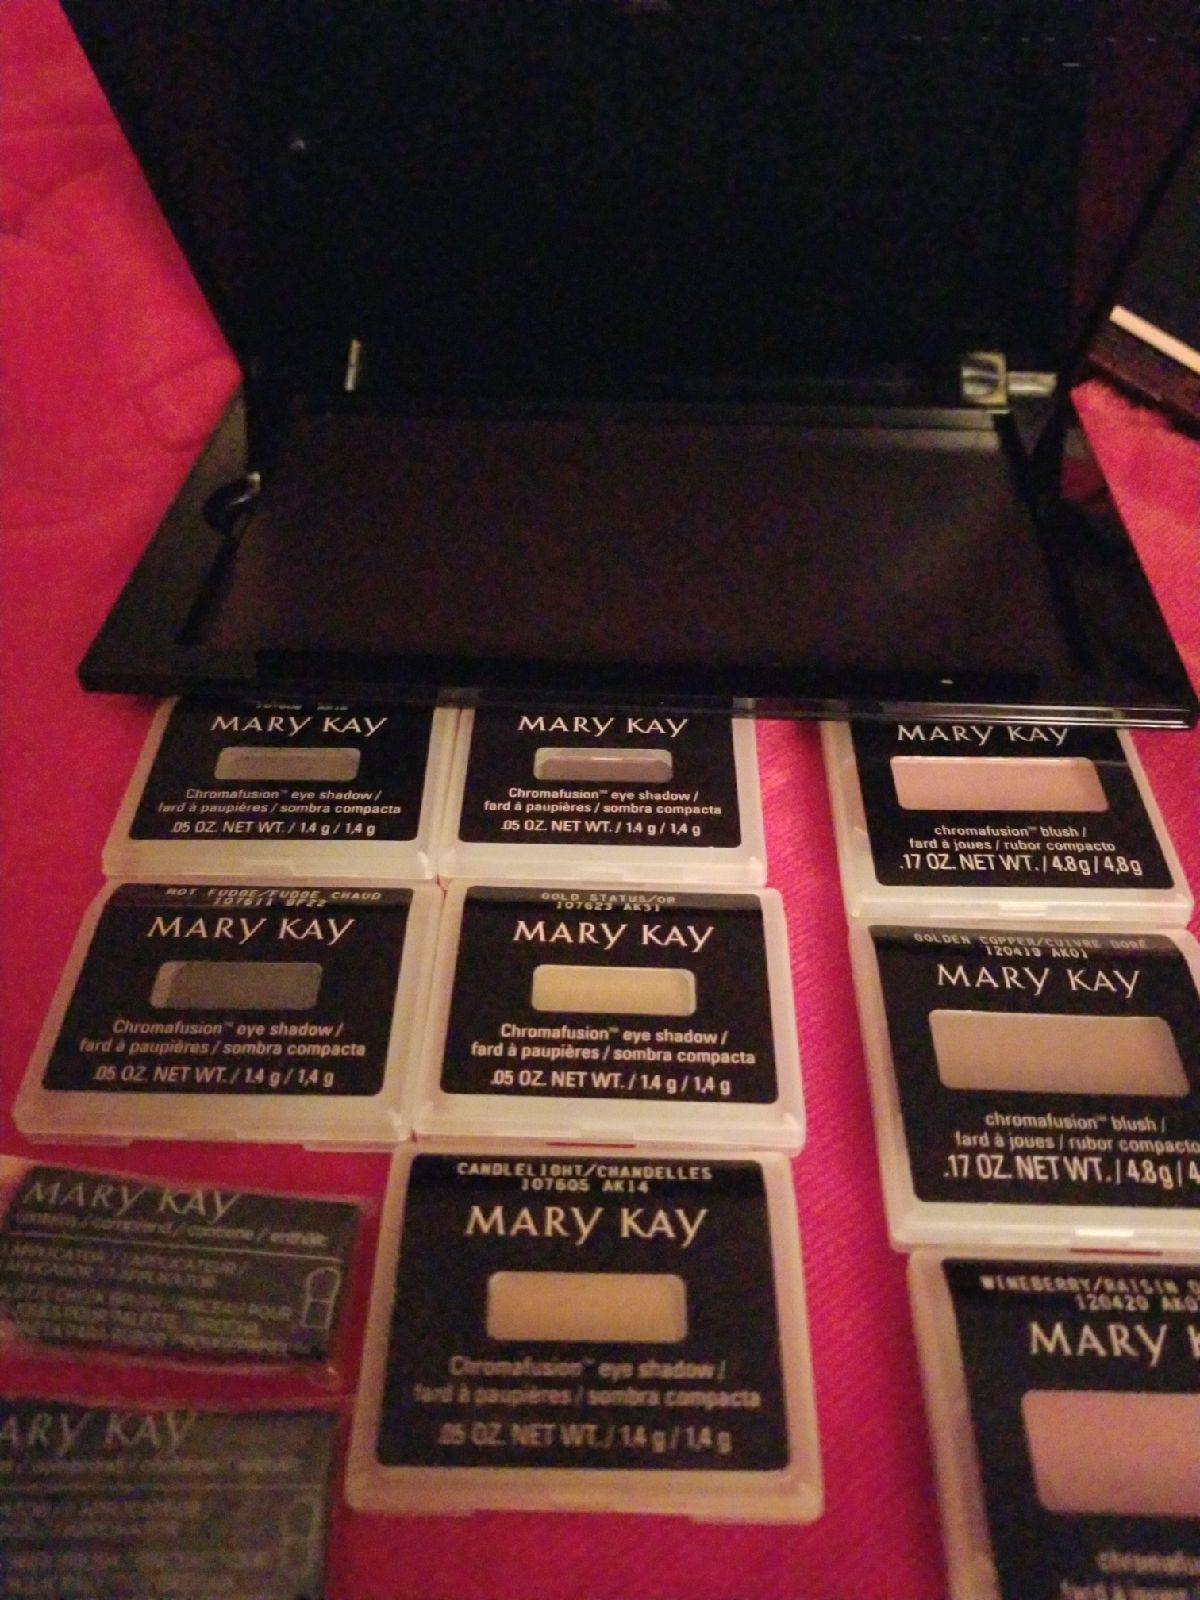 Mary Kay blush/shadow/case/applicators